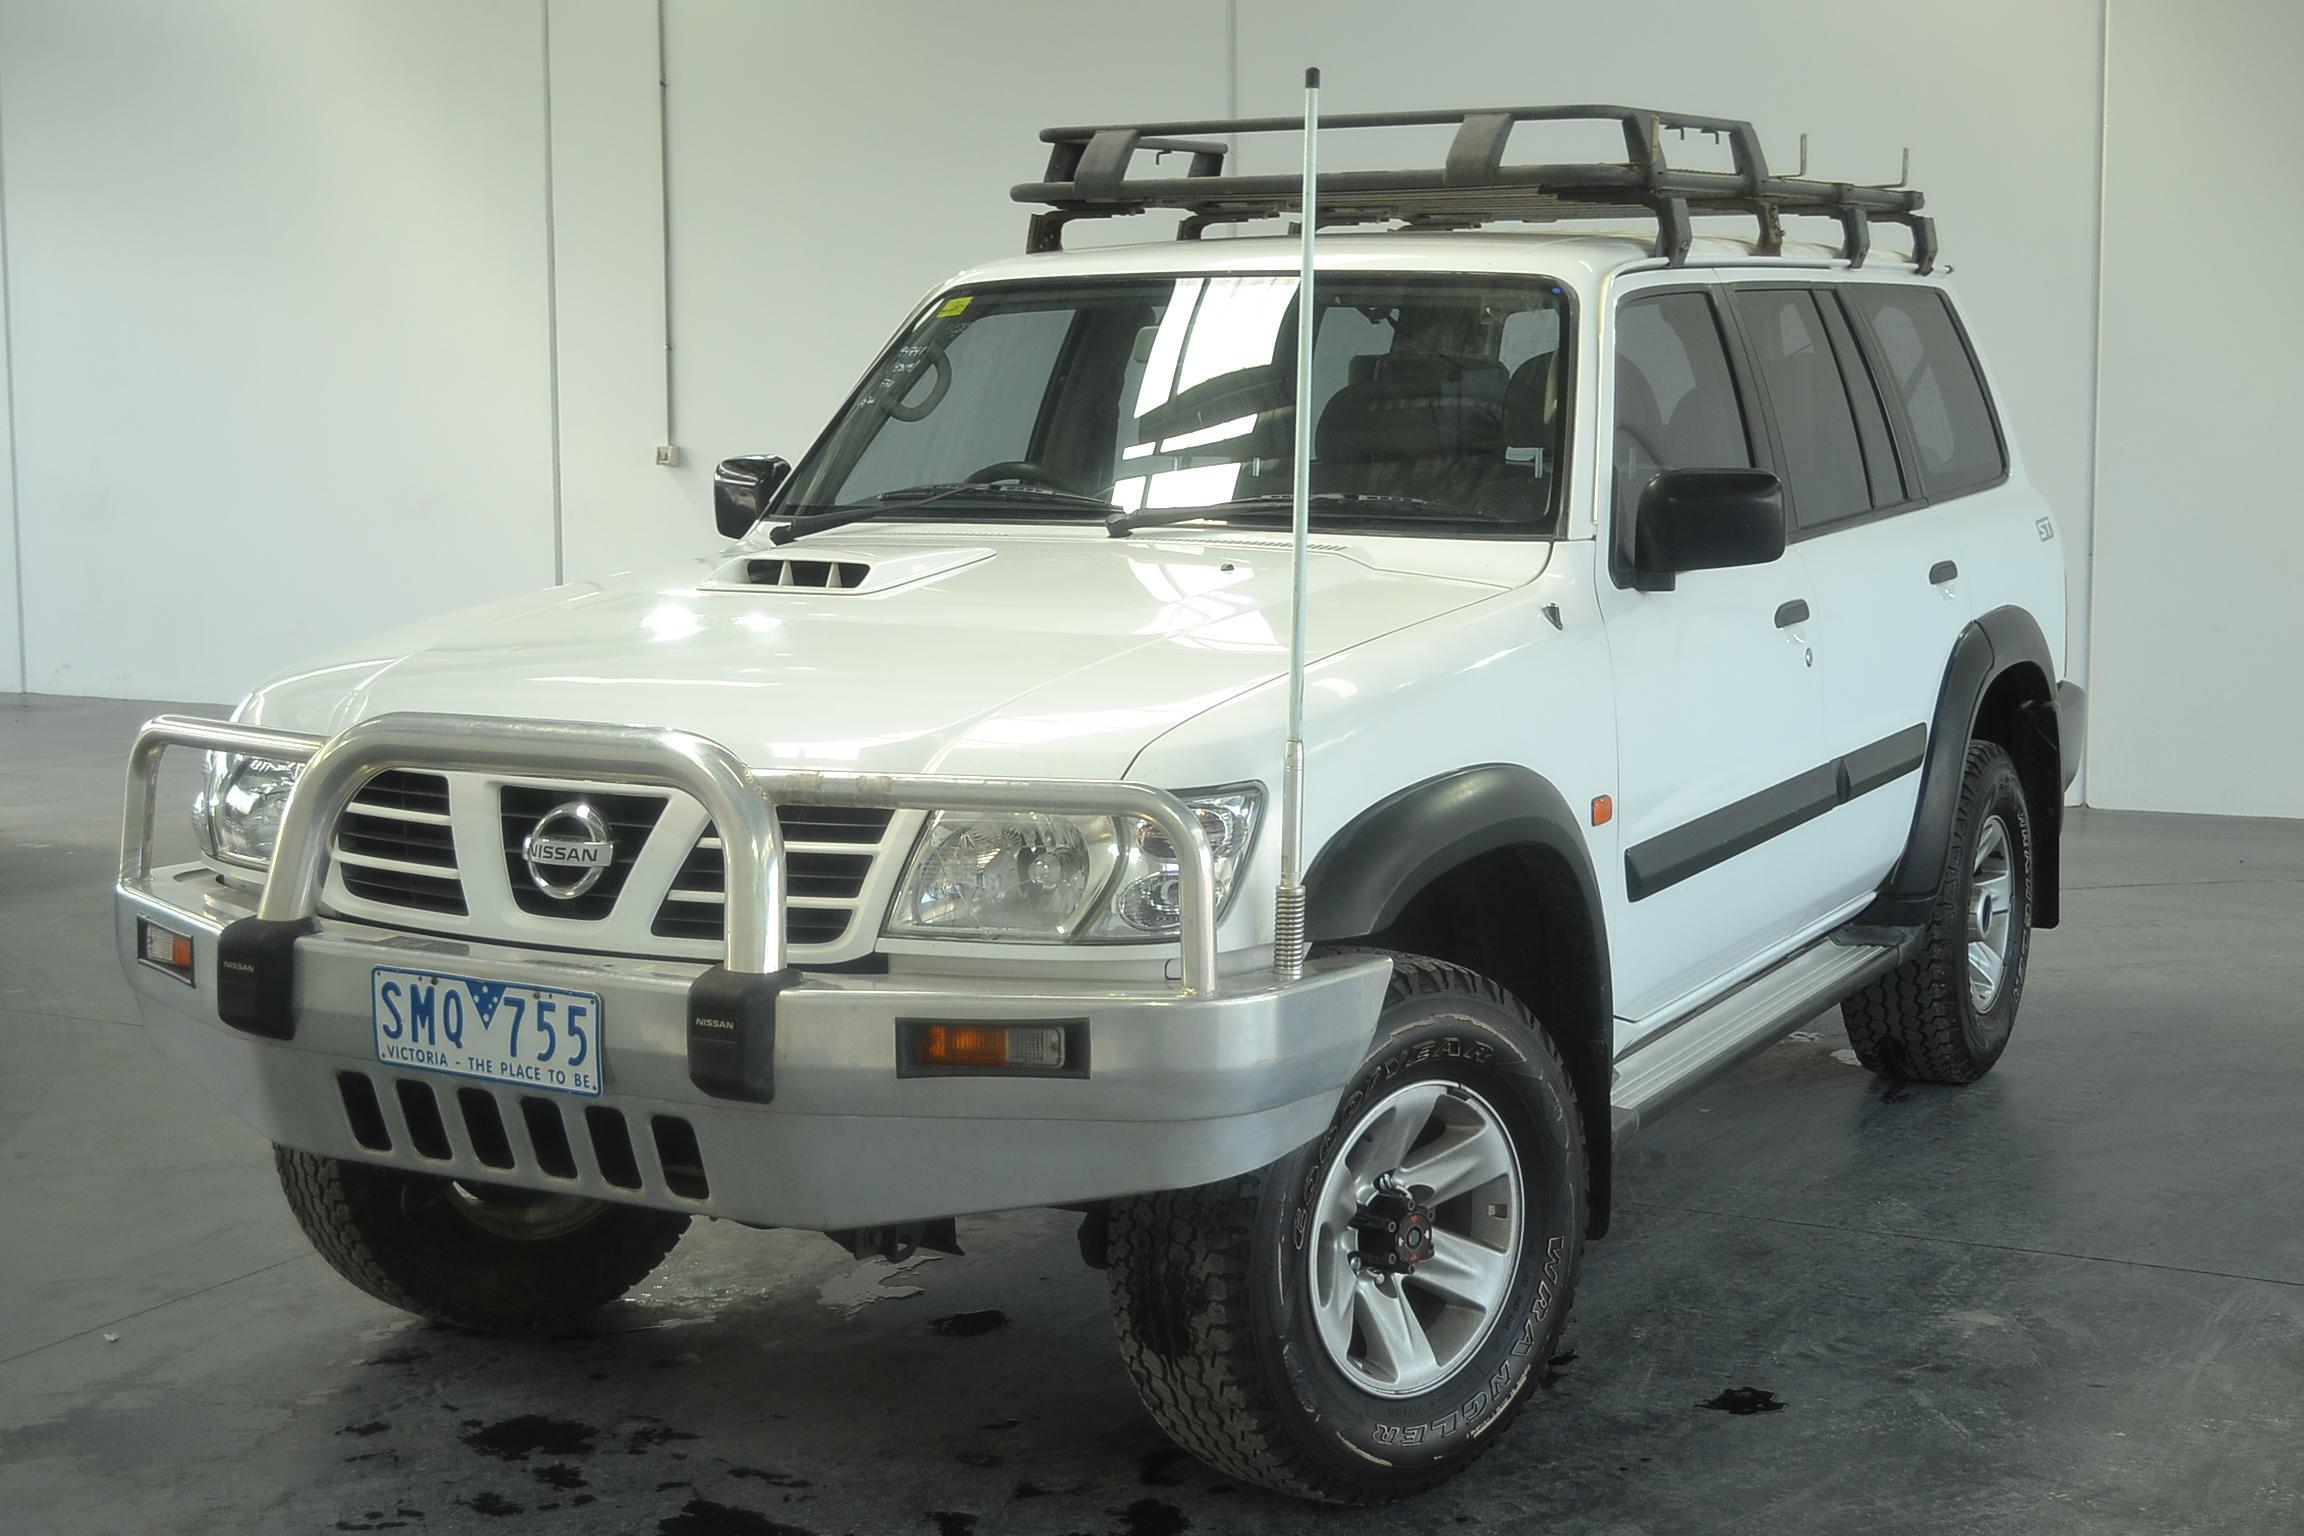 2003 nissan patrol st 3 0 gu ii turbo diesel manual 5 speed 7 seats wagon